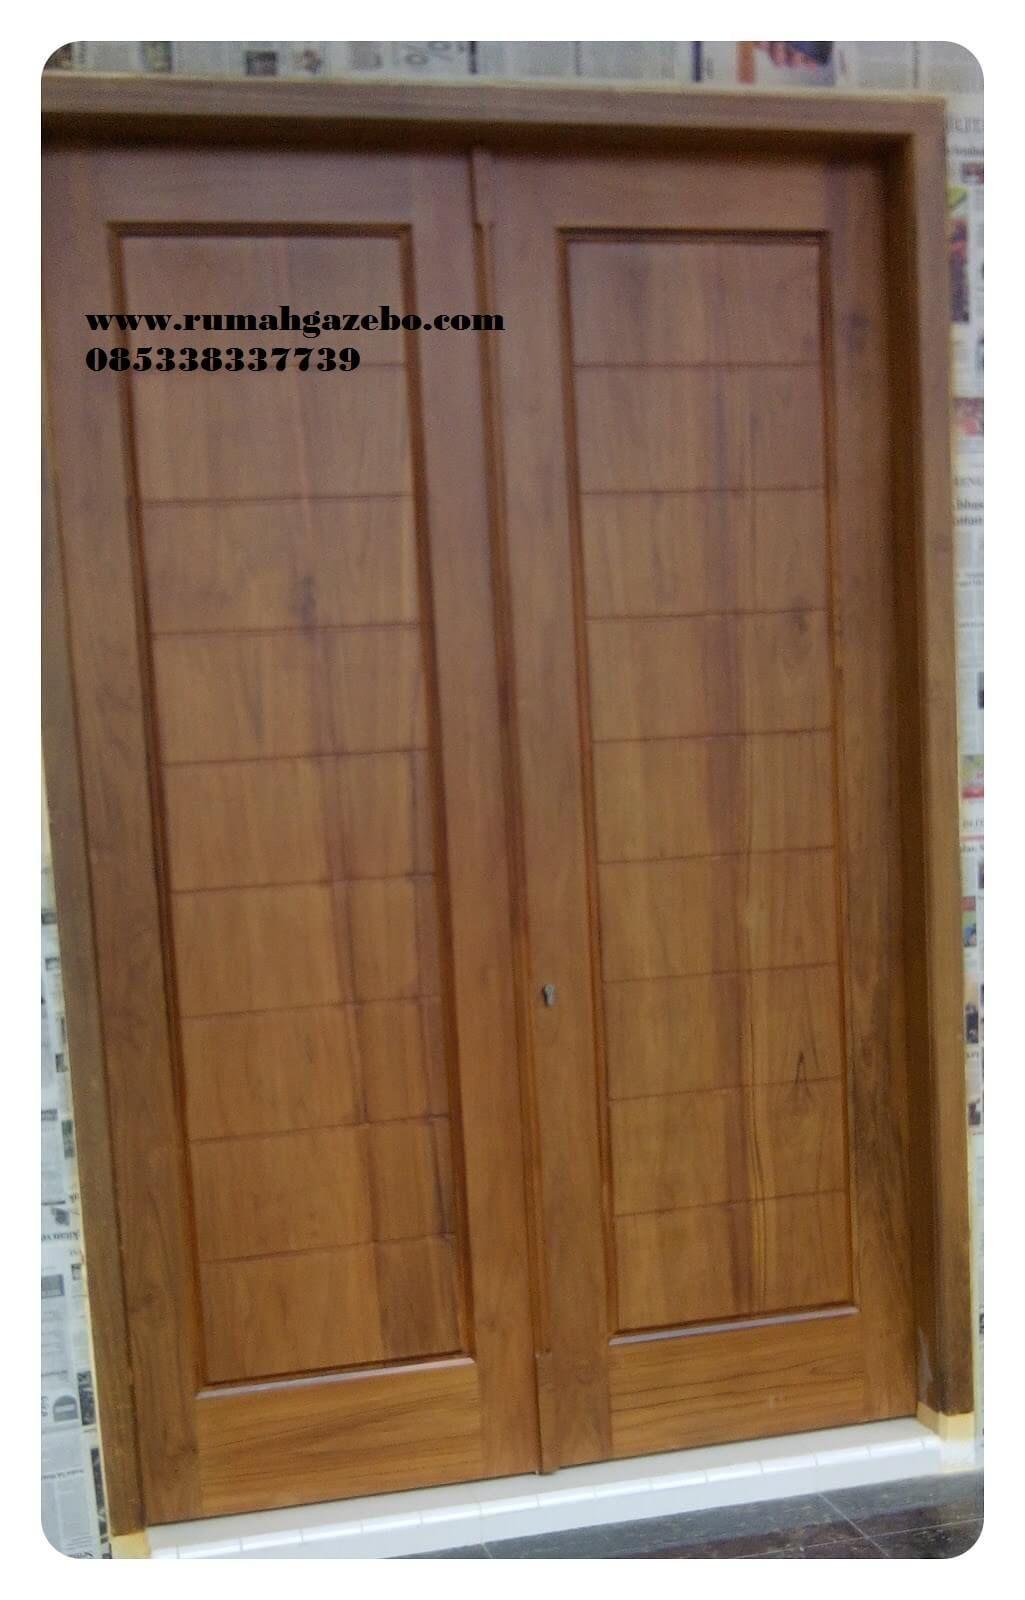 Model Pintu  Minimalis 2 Pintu  Kusen Pintu  Pinterest